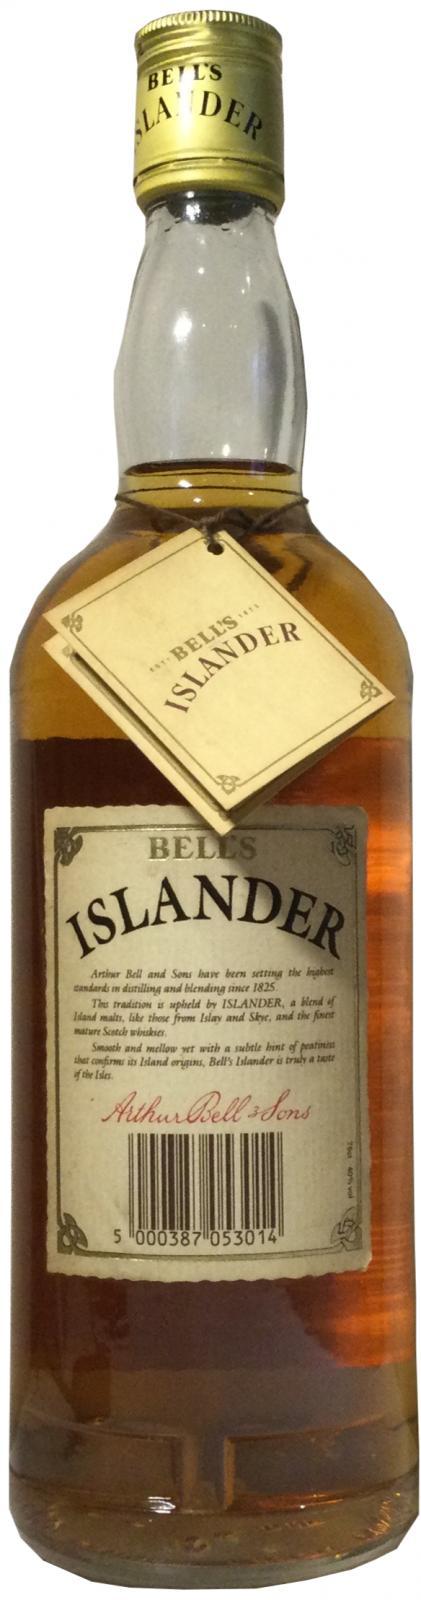 Bell's Islander - Island & Malts